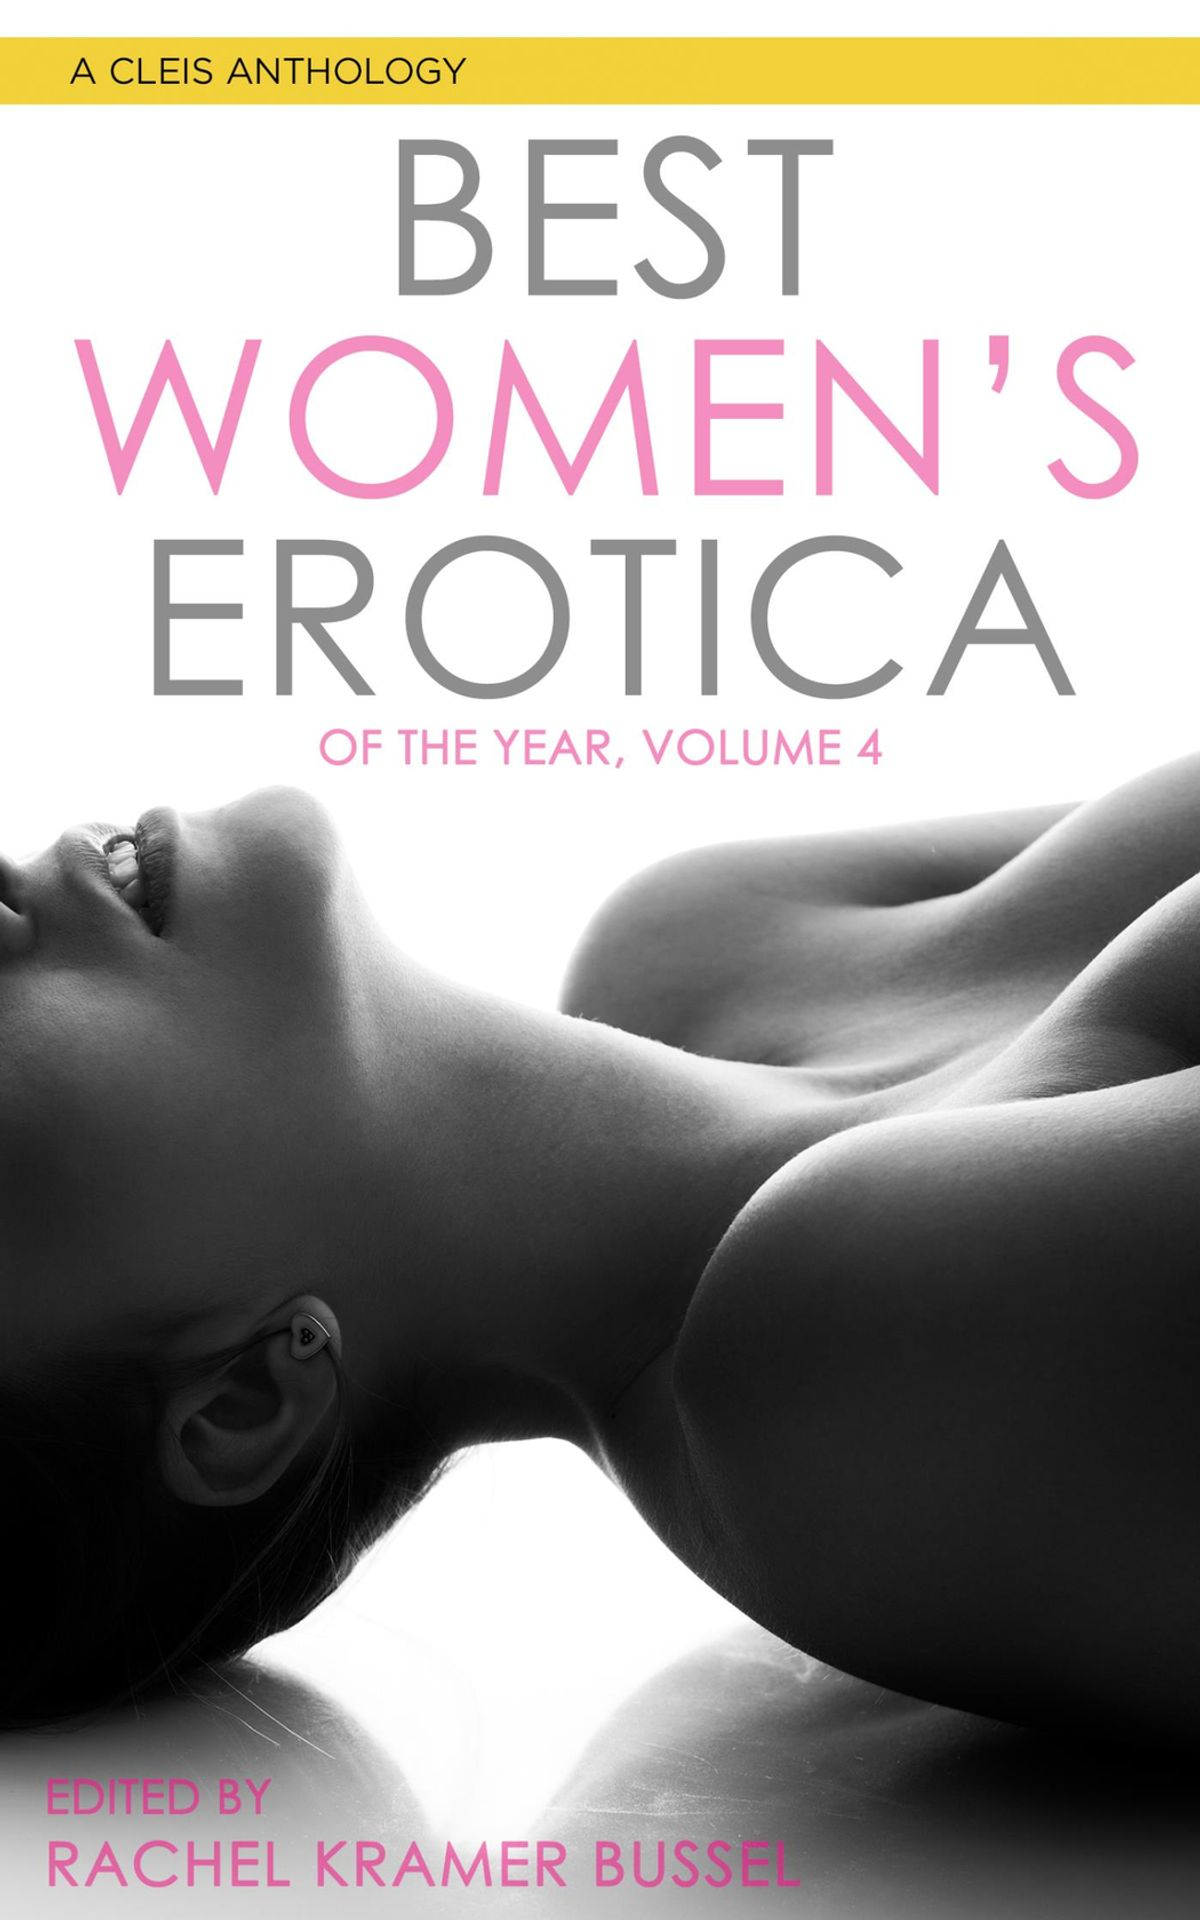 Best Women's Erotica of the Year, Volume 4